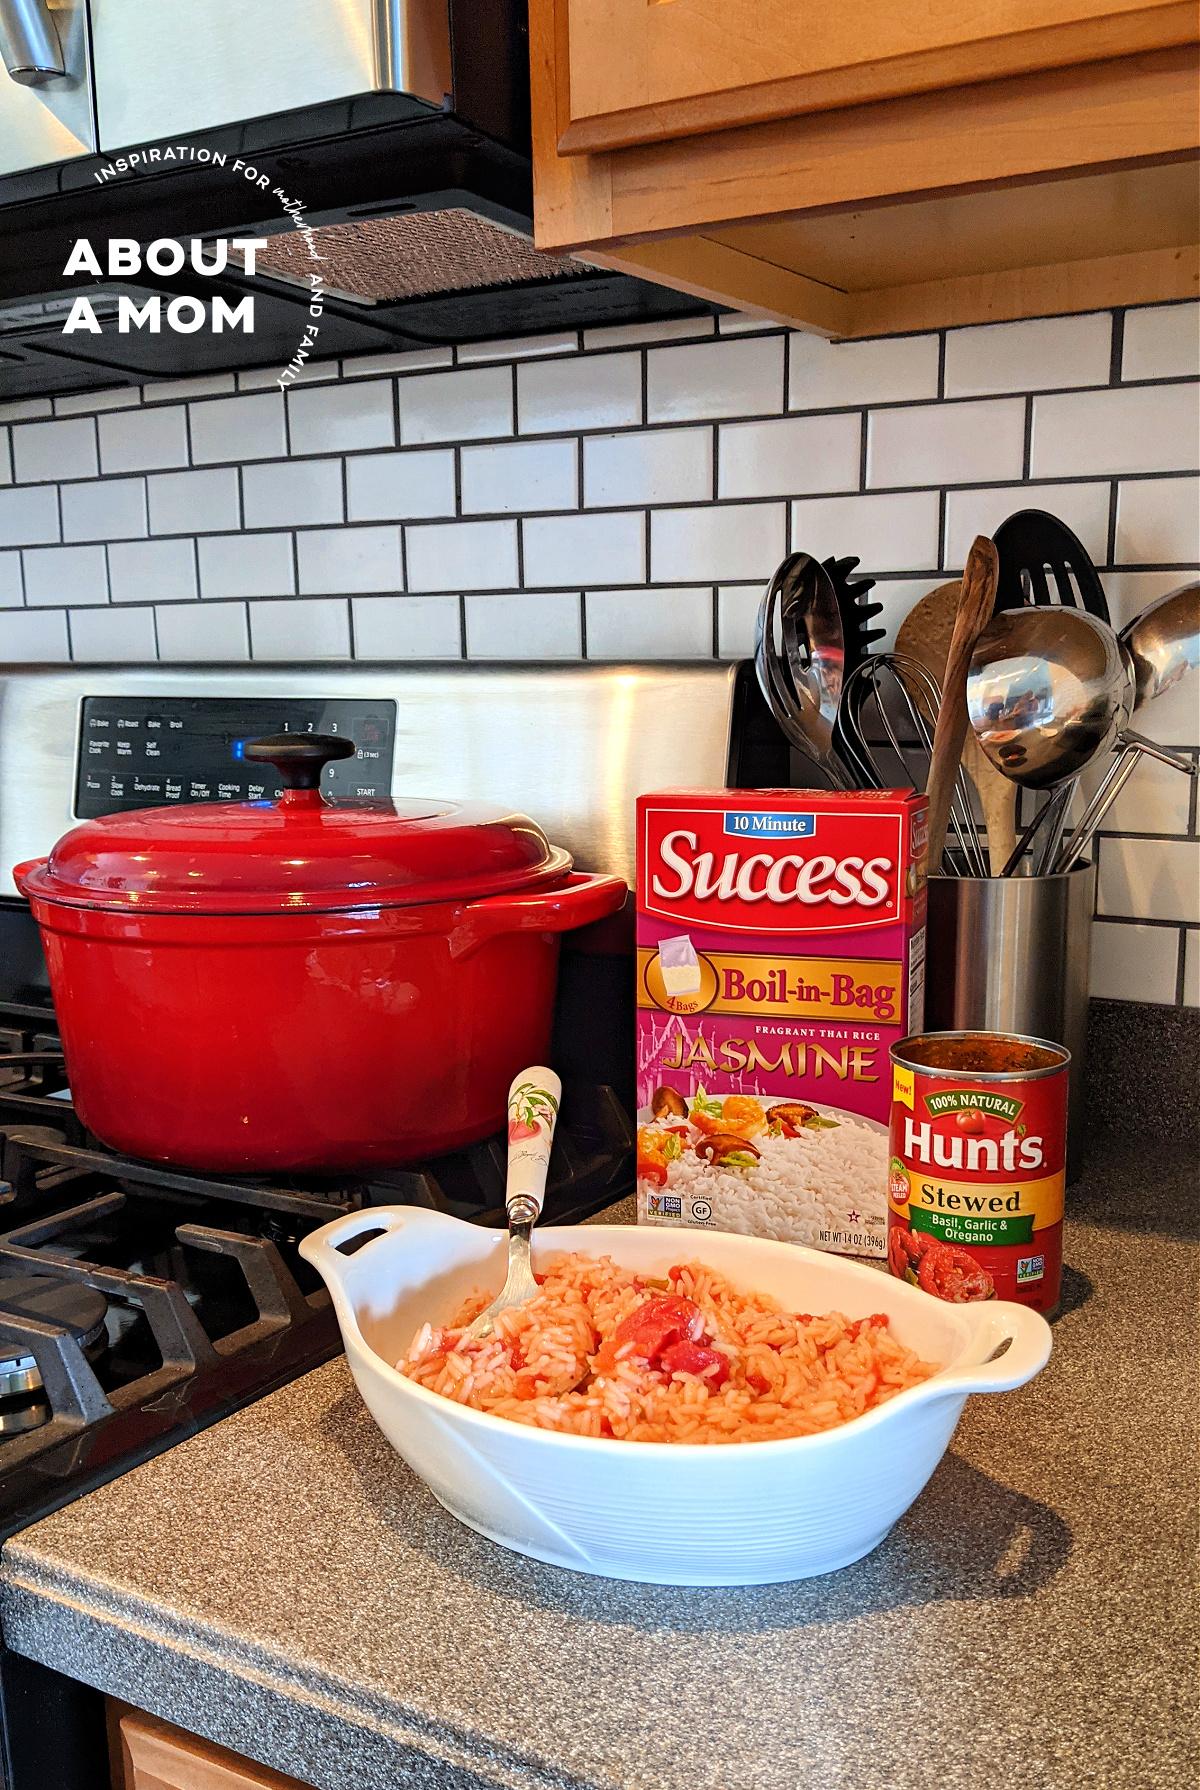 Hunt's Basil, Garlic and Oregano Stewed Tomatoes and Success Rice Jasmine Rice